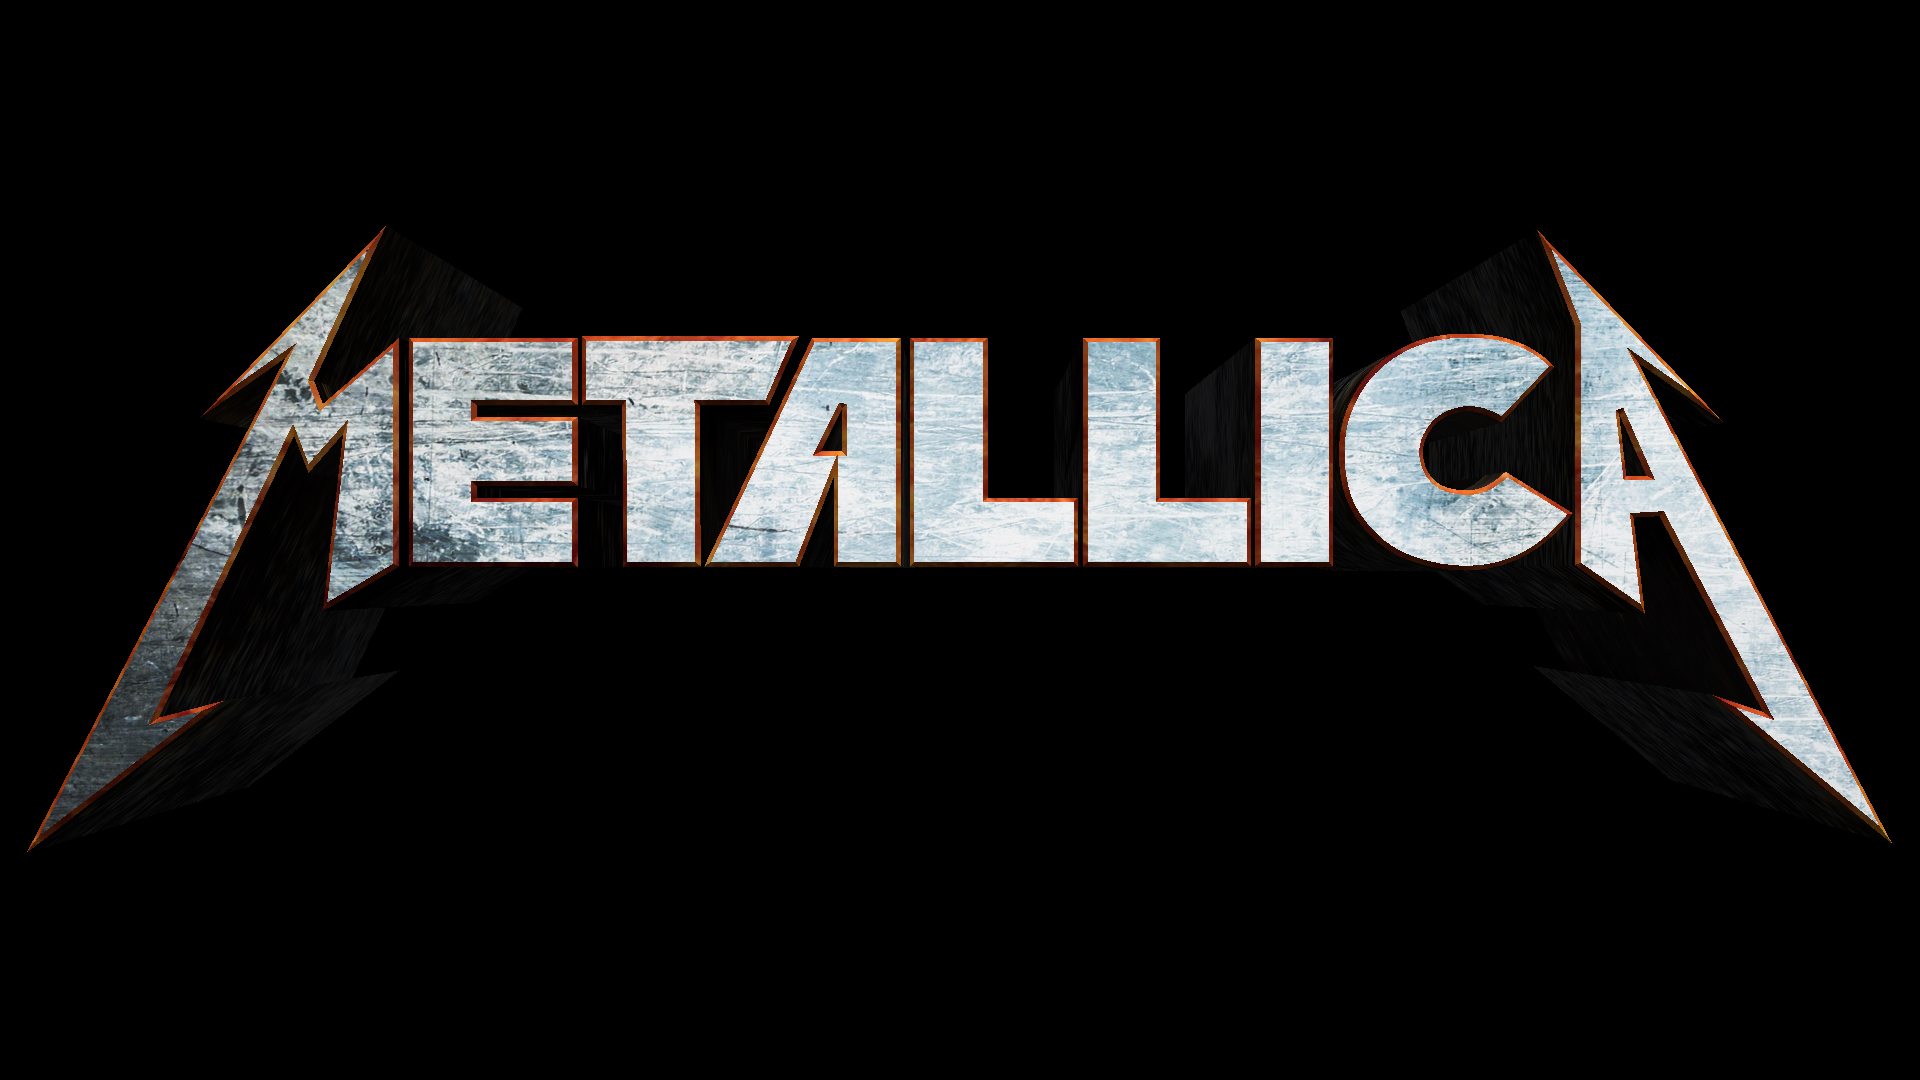 Metallica Tour Dates 2014 Upcoming Concert List 1920x1080